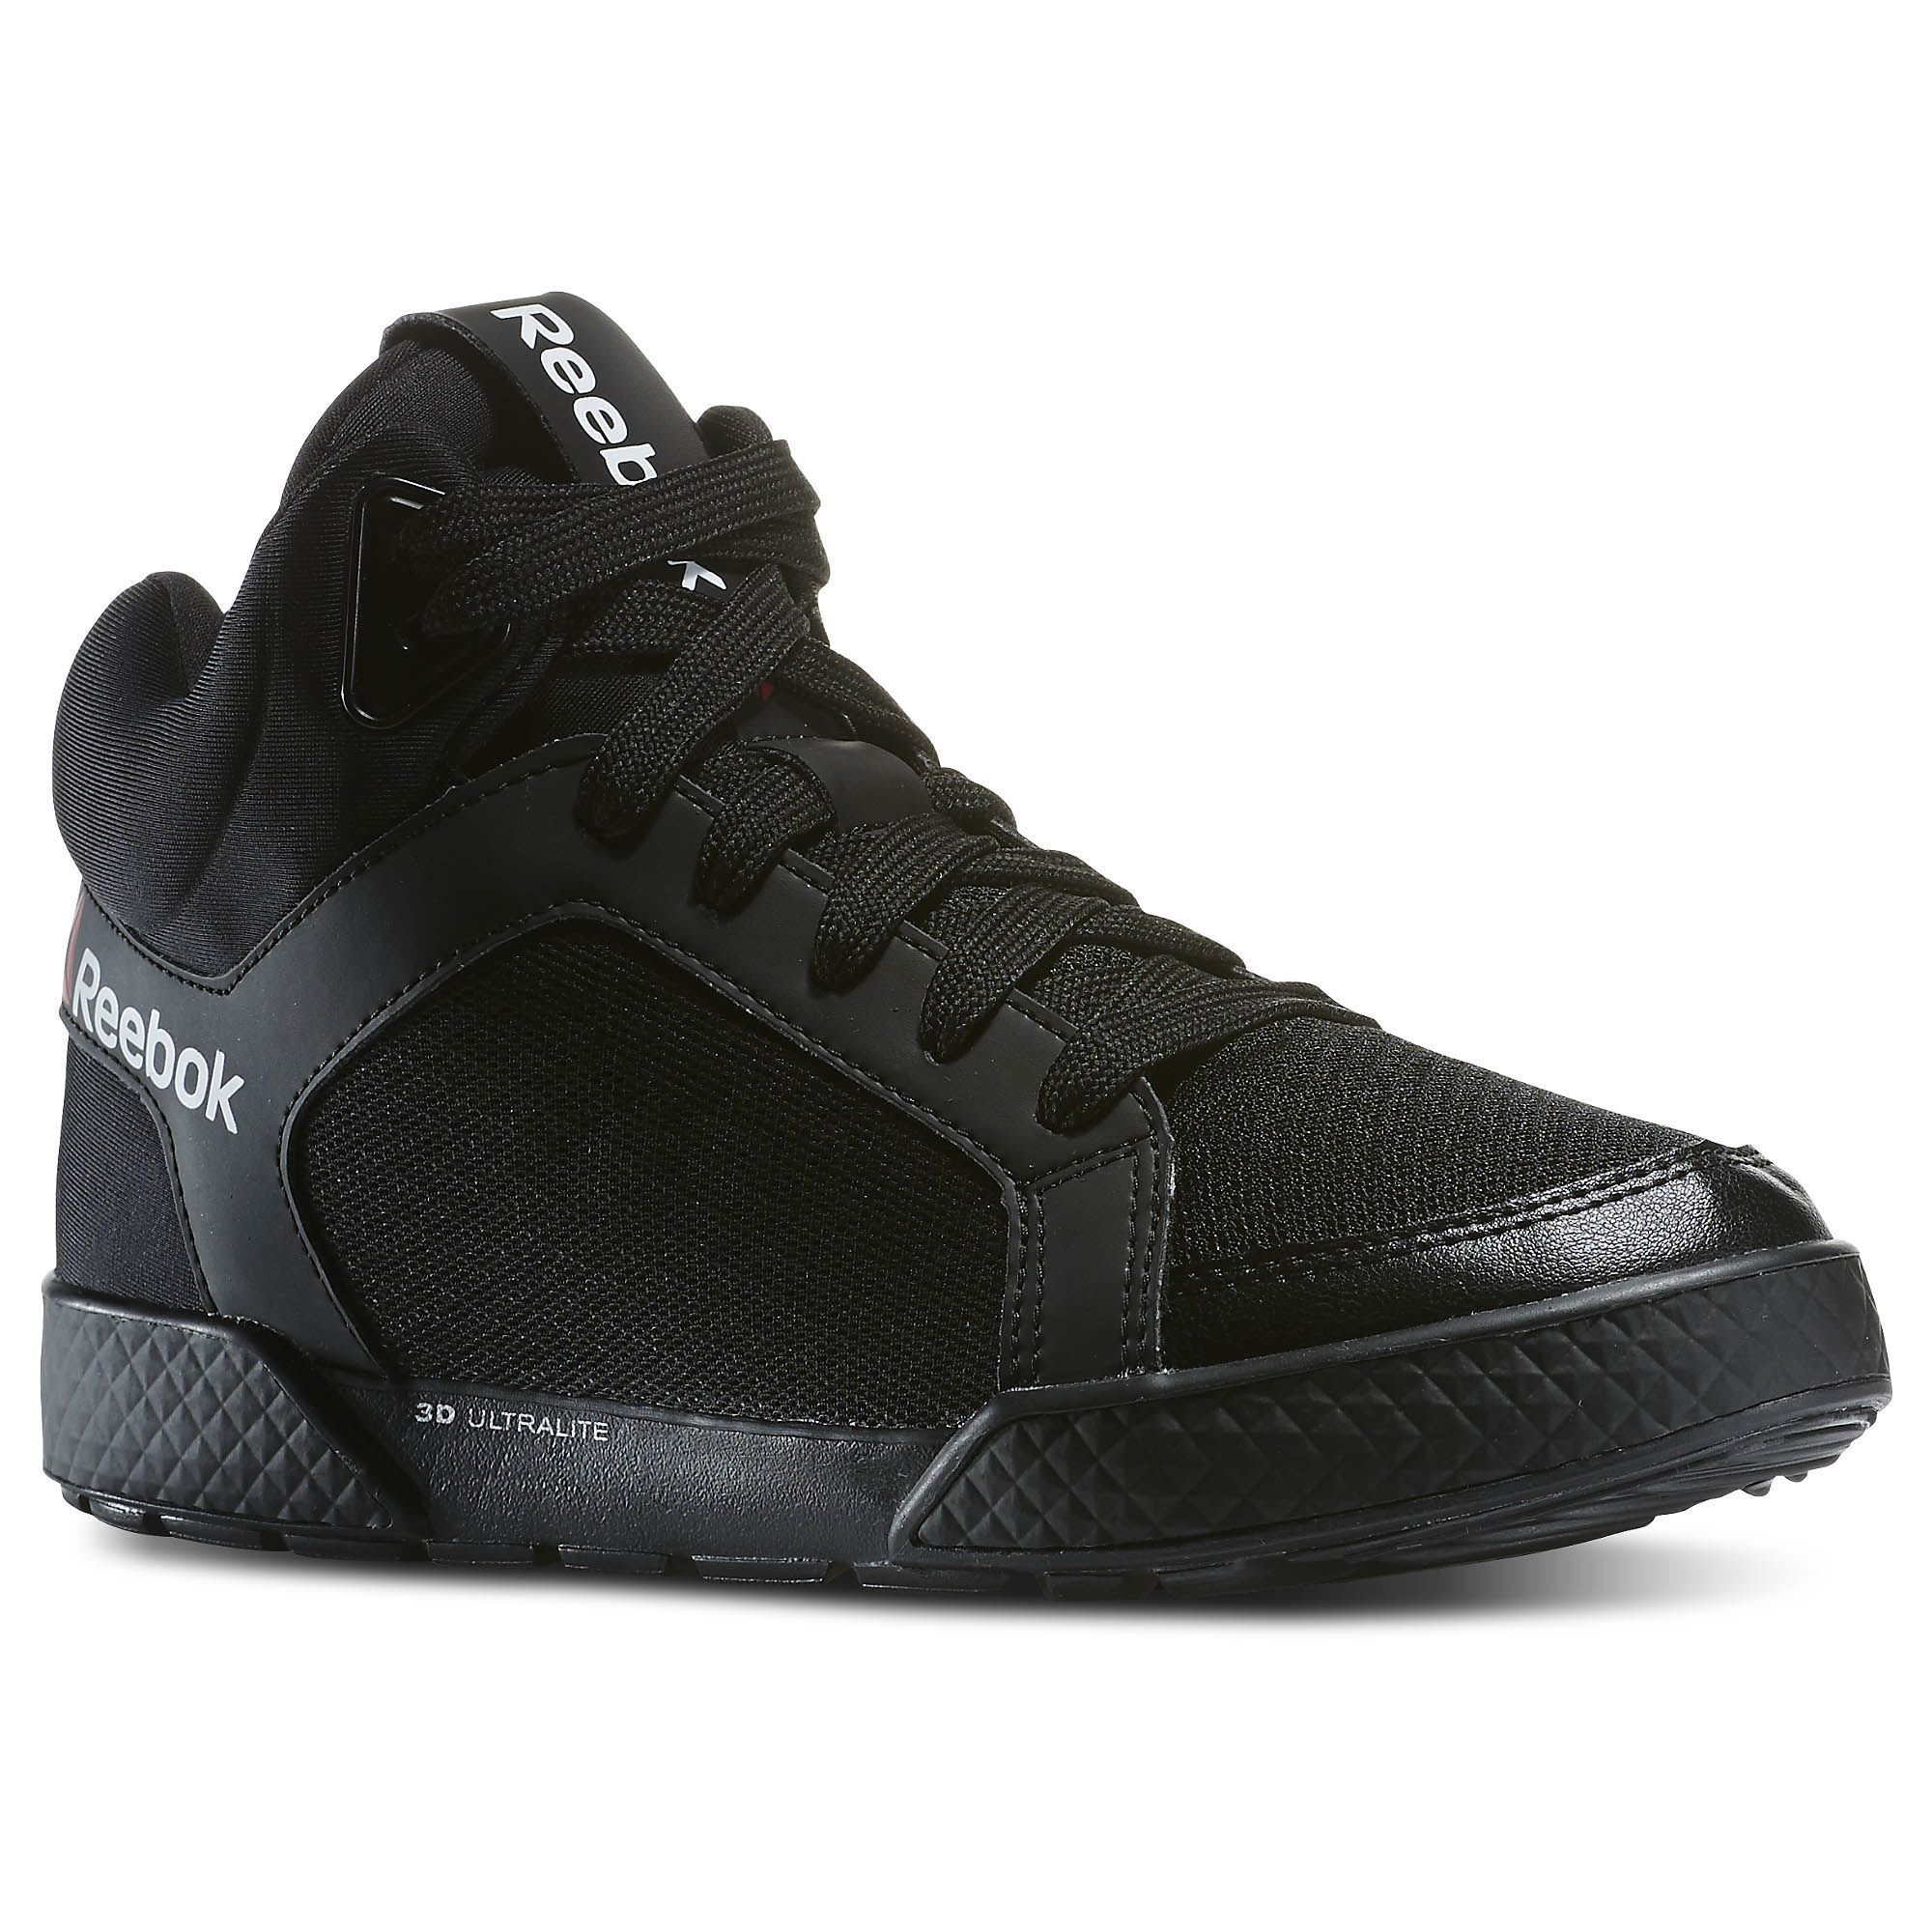 Reebok Dance UrTempo Mid 3.0 TXL | Reebok Shoes | Black